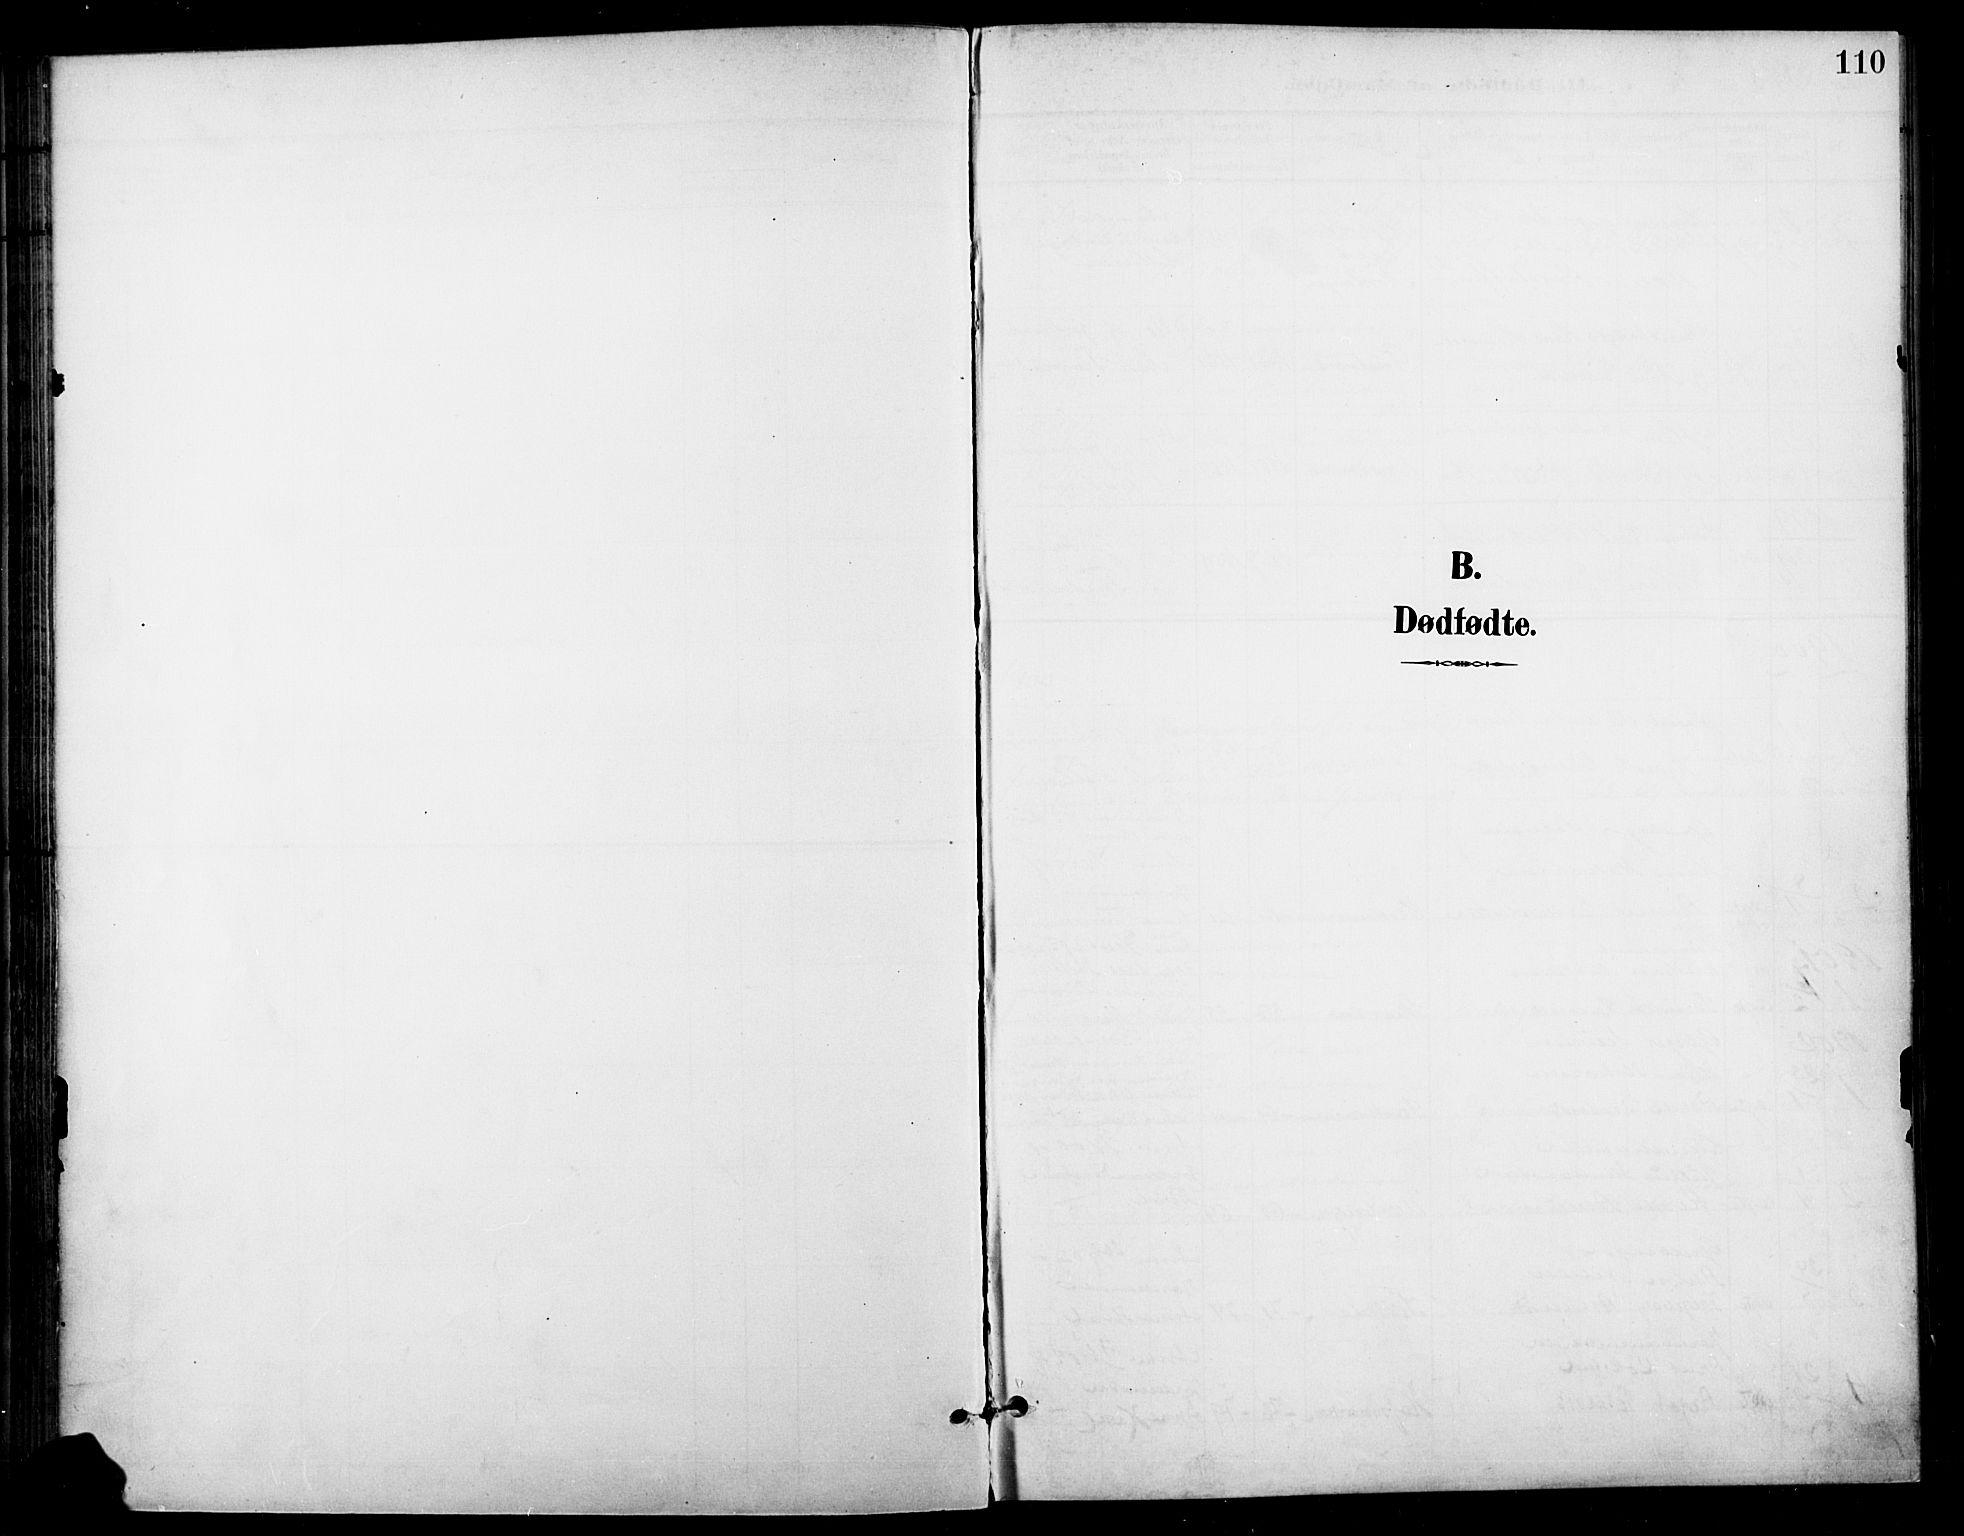 SAH, Gran prestekontor, Ministerialbok nr. 19, 1898-1907, s. 110